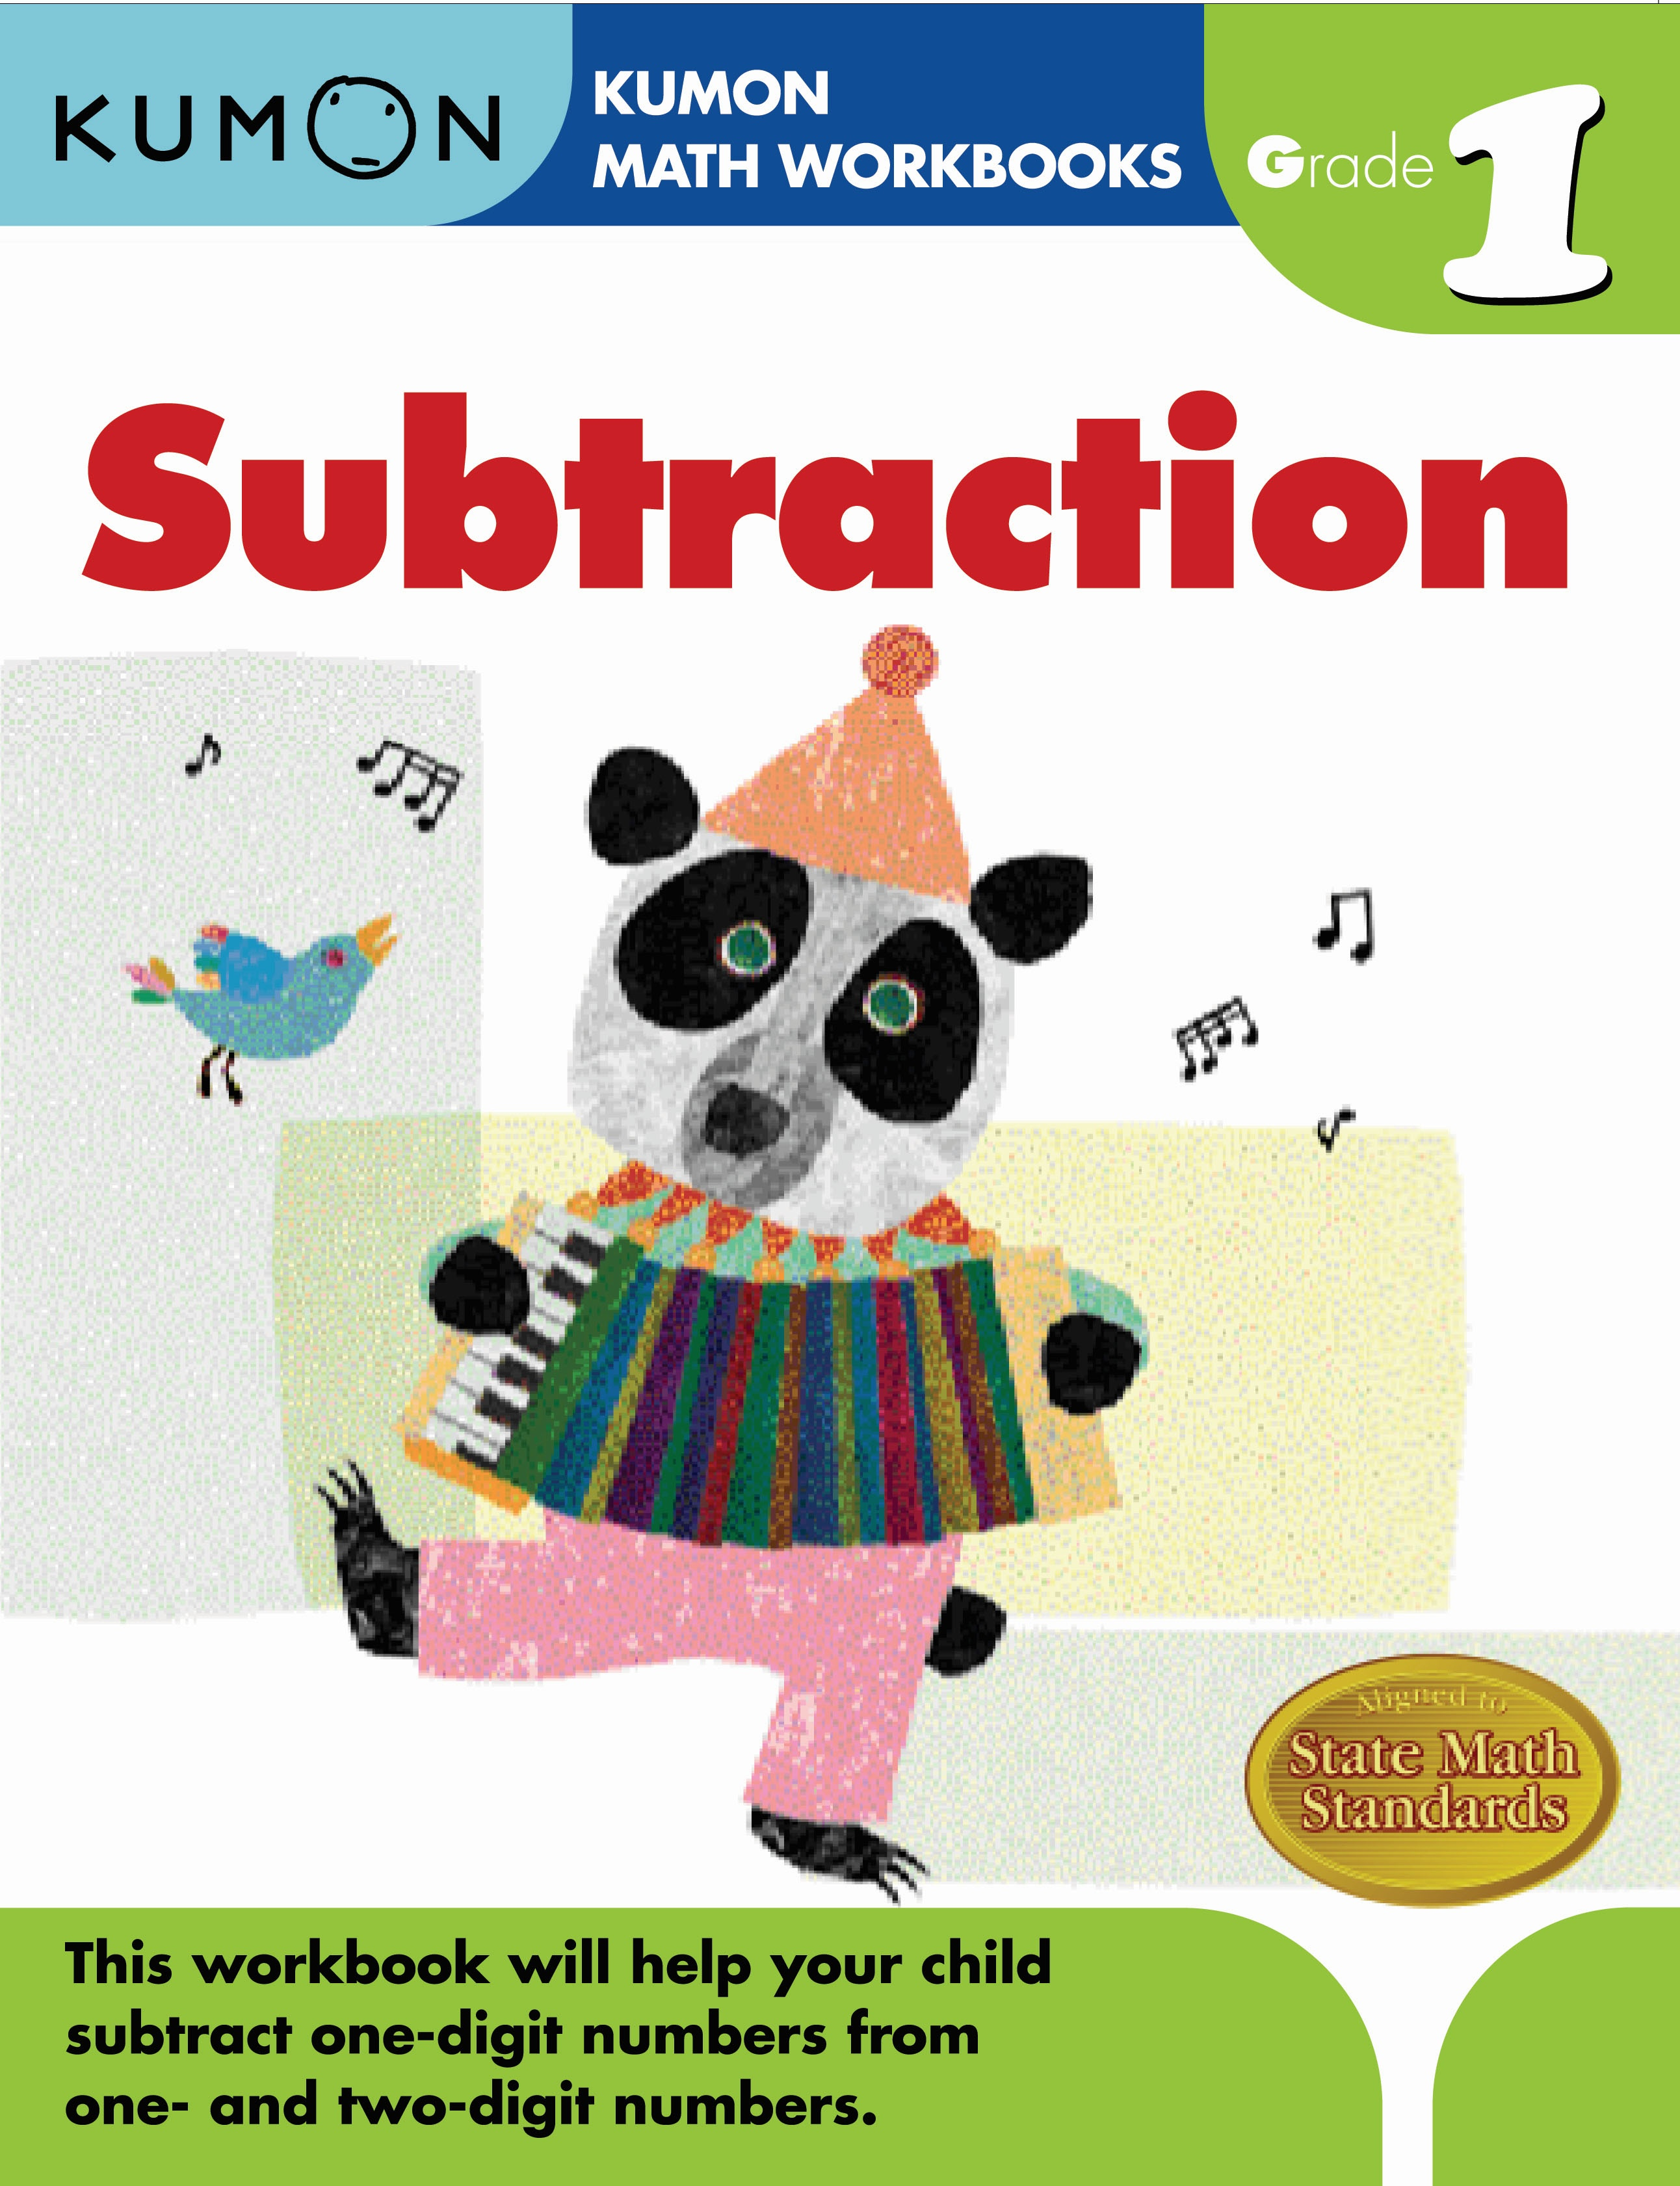 Kumon Publishing | Kumon Publishing | Math Workbooks - Free Printable Math Workbooks